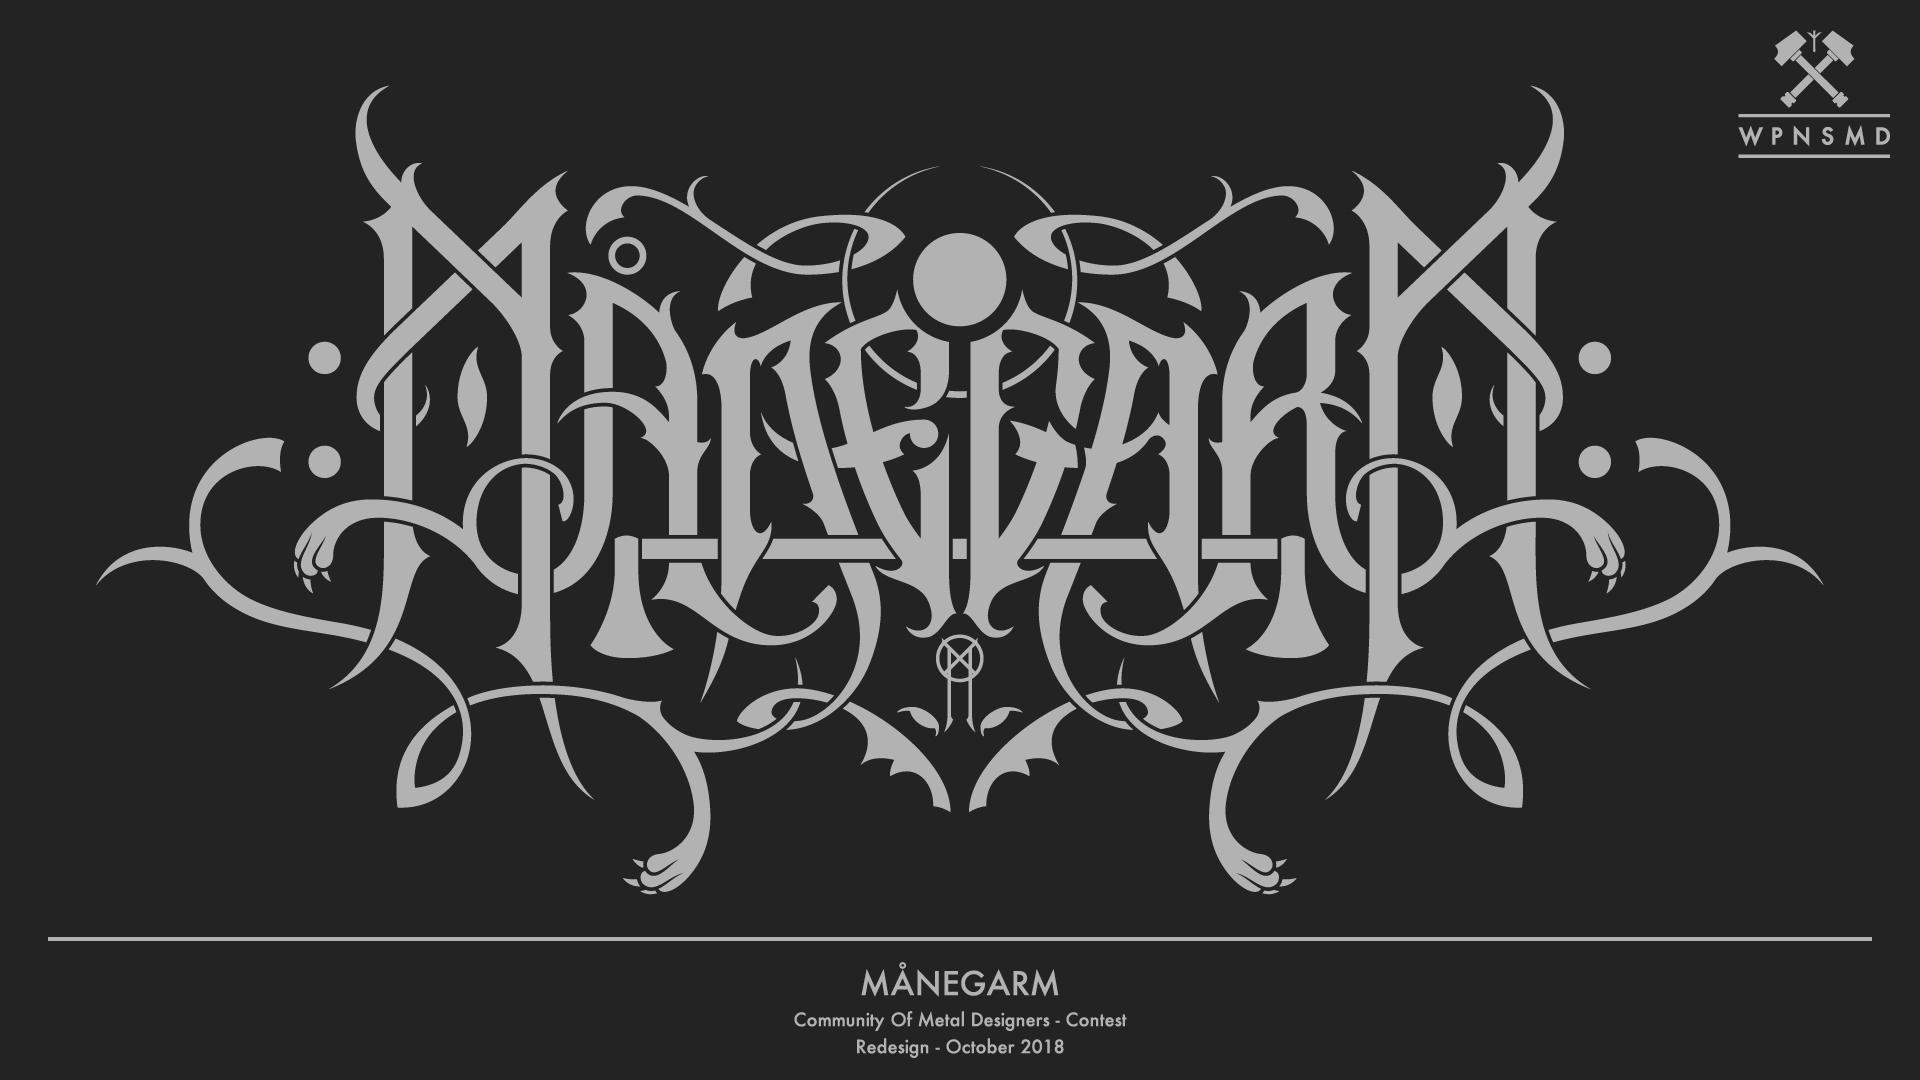 COMD_6_Manegarm.jpg